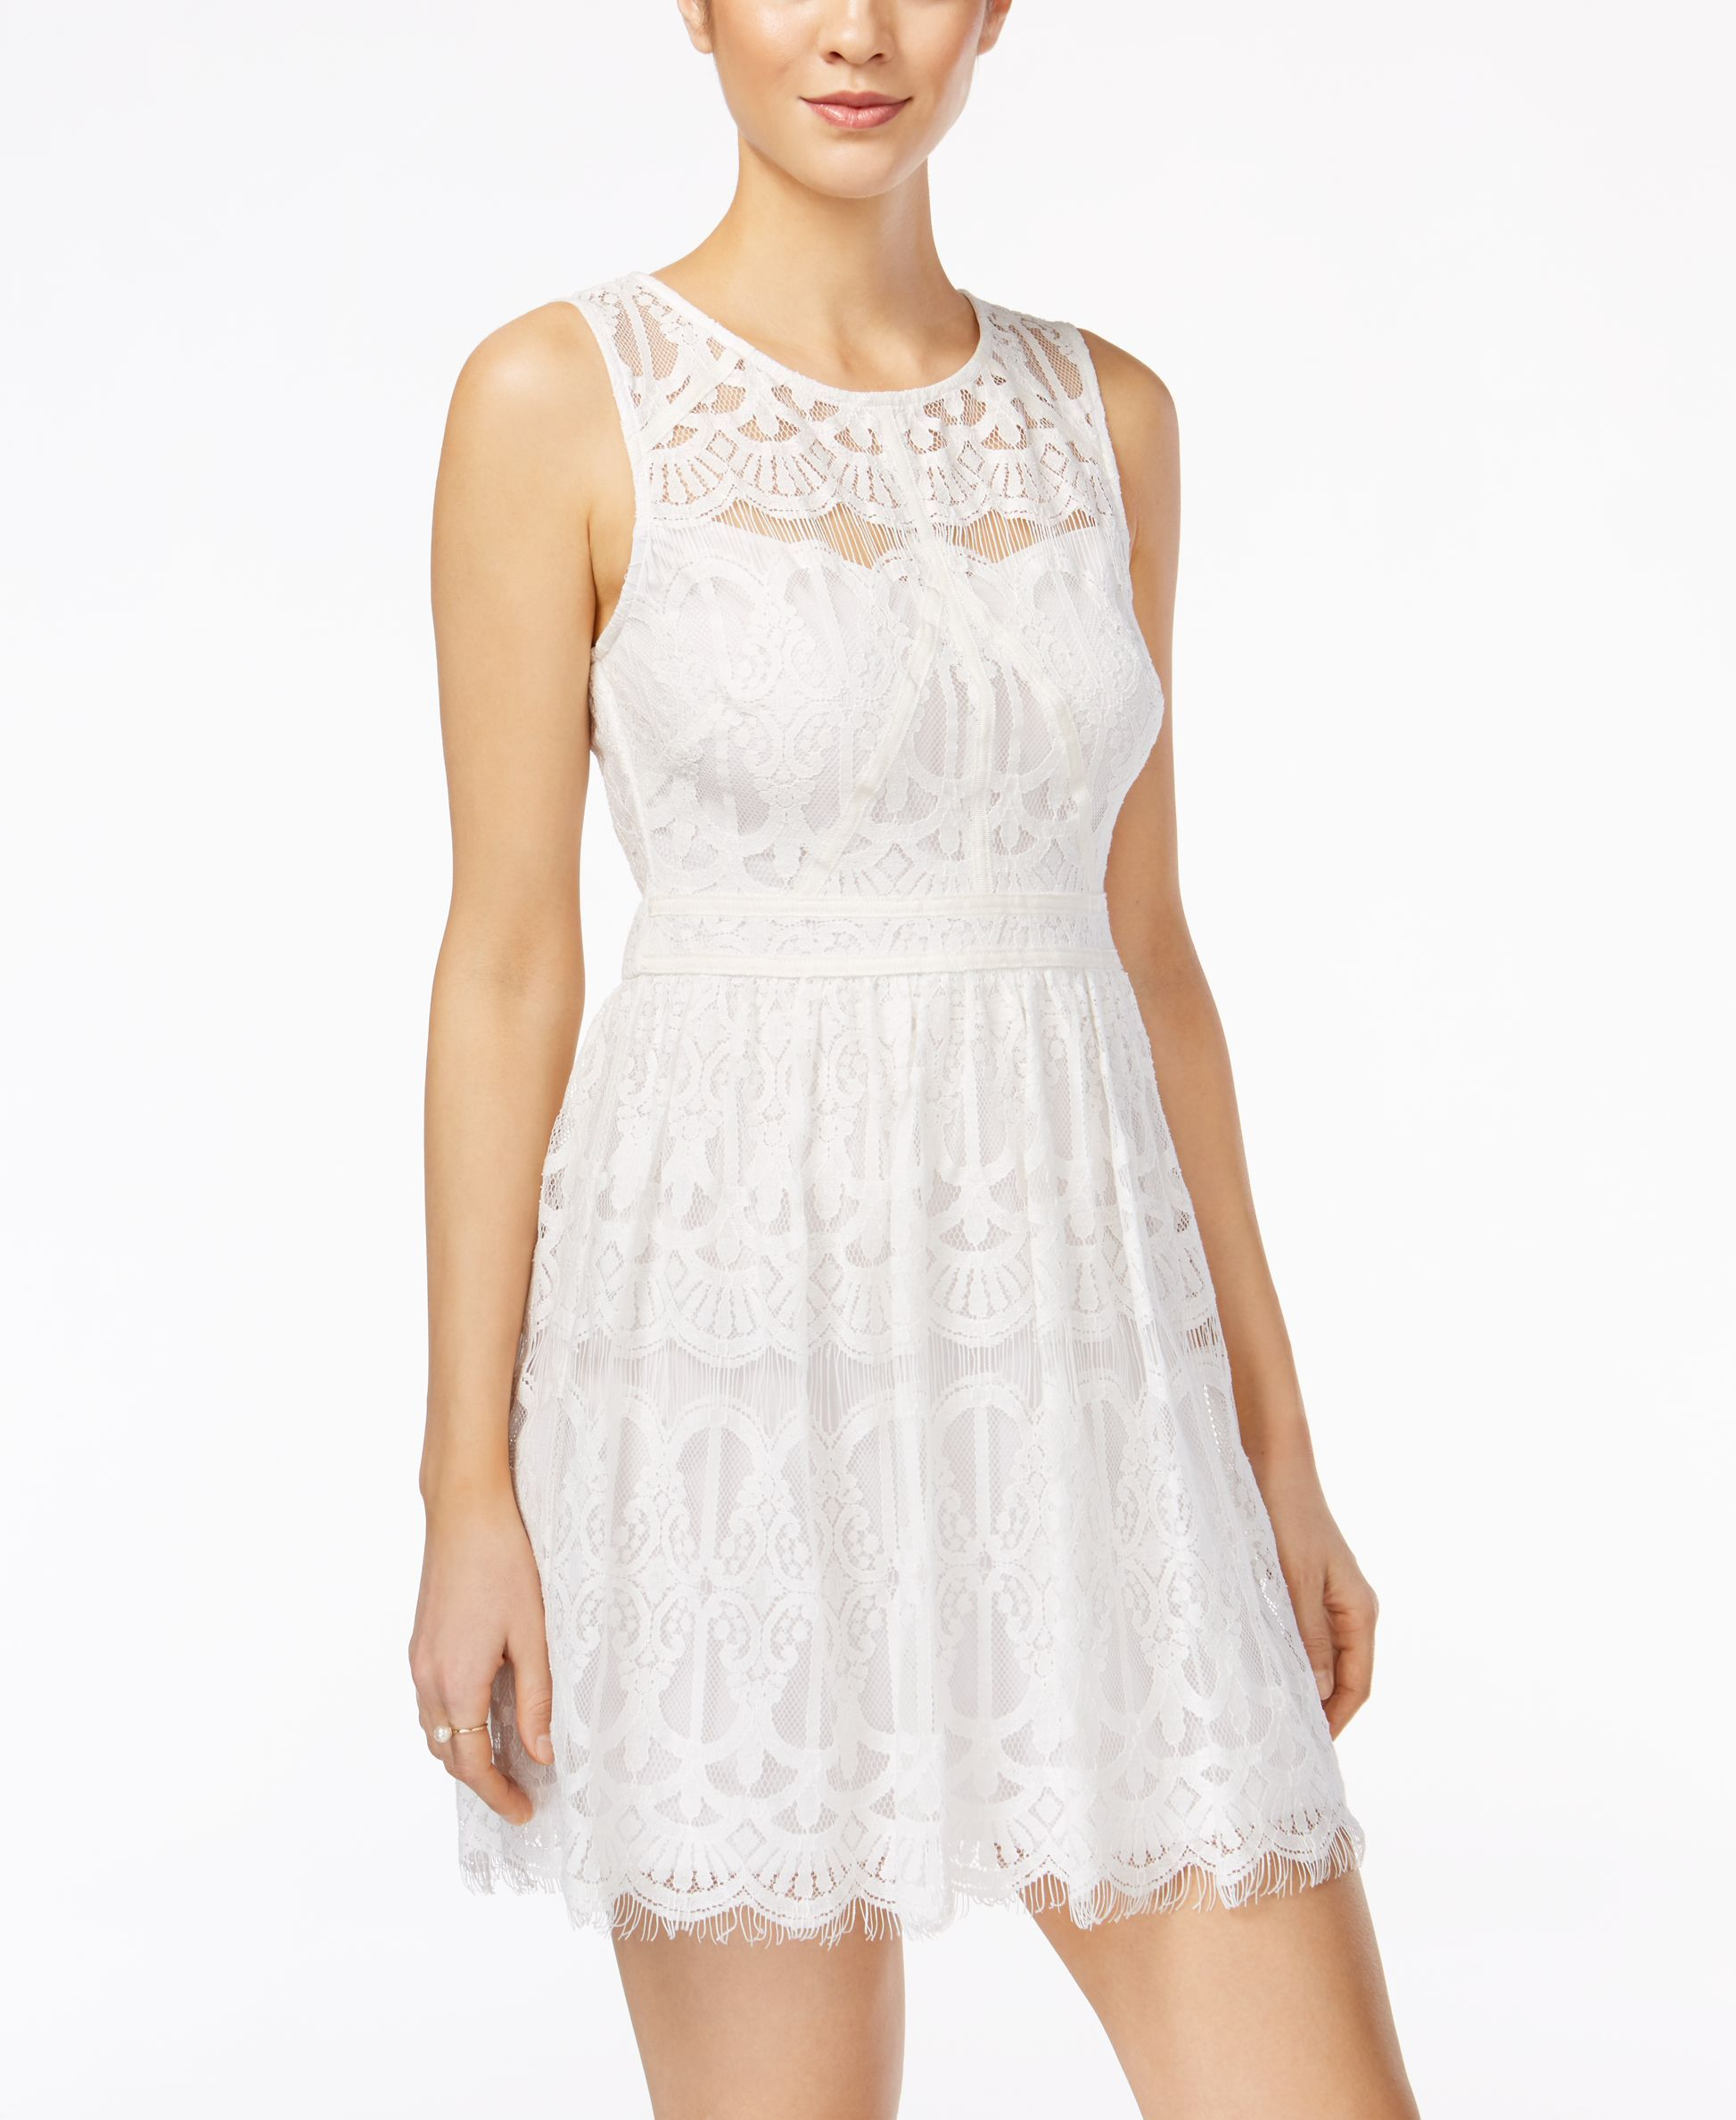 Lace dress macys  As U Wish Juniorsu Illusion Lace Dress  Products  Pinterest  Products